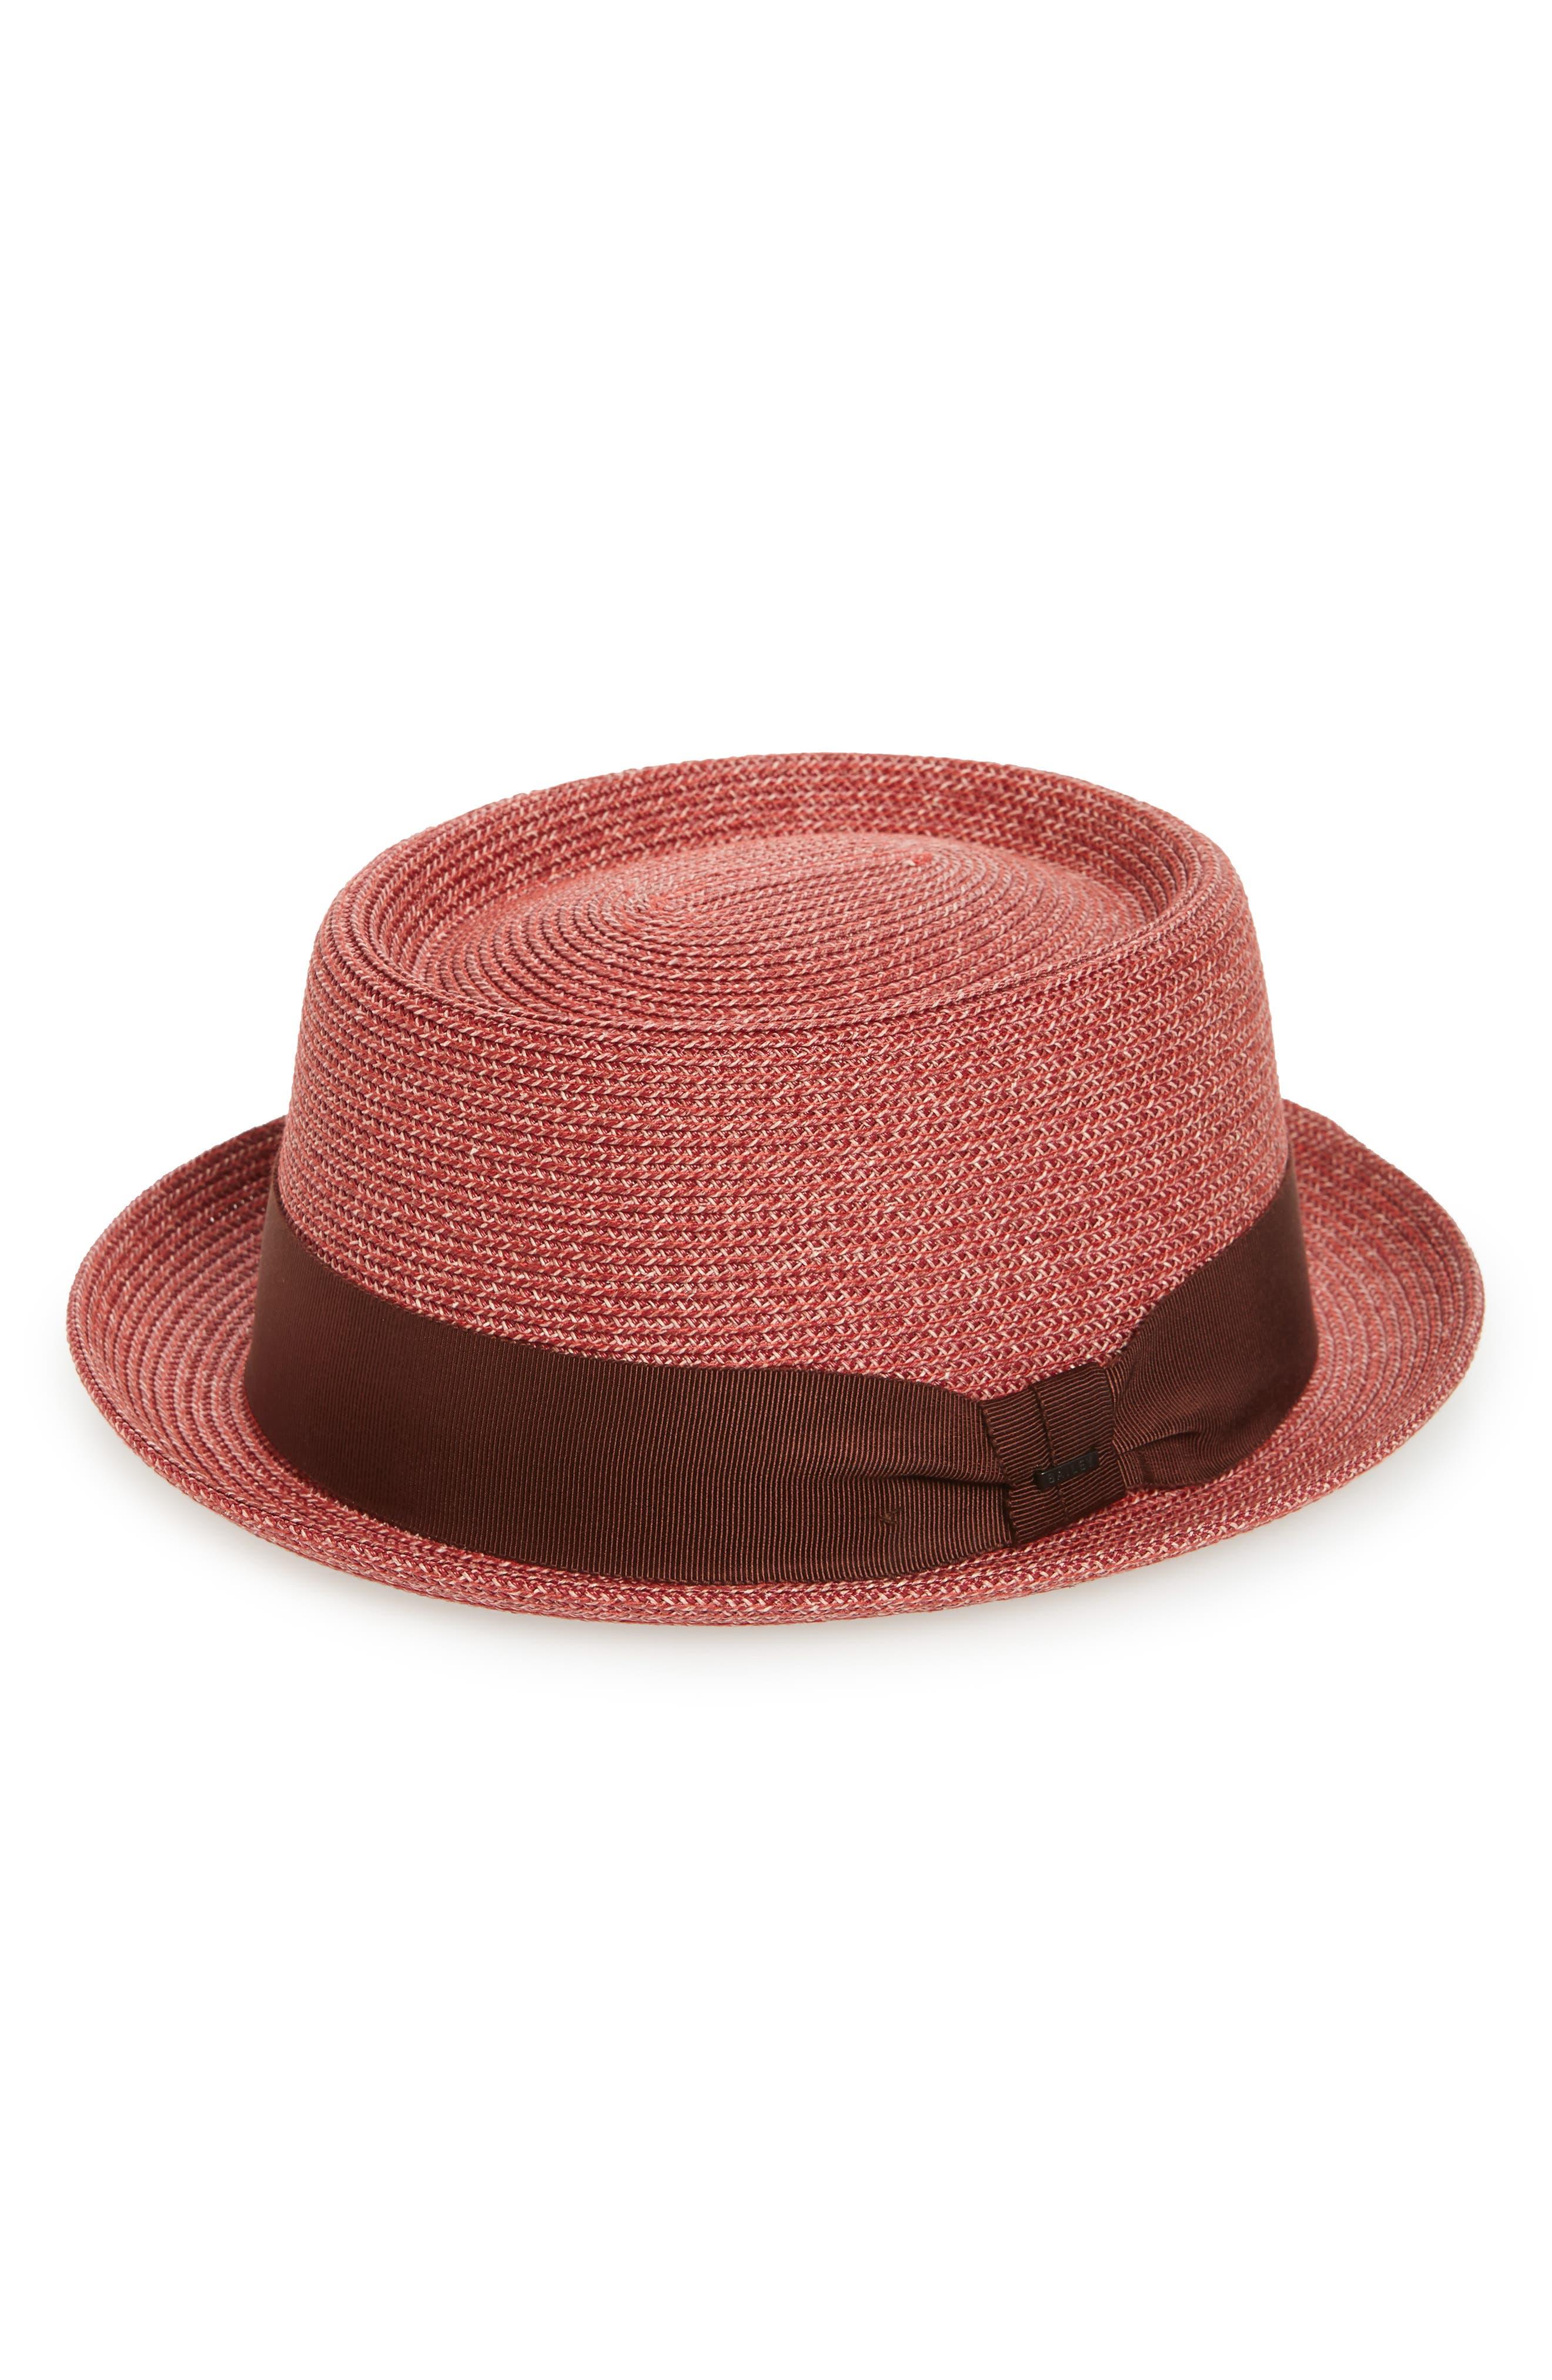 1960s Men's Clothing, 70s Men's Fashion Mens Bailey Waits Porkpie Hat - Red $34.98 AT vintagedancer.com